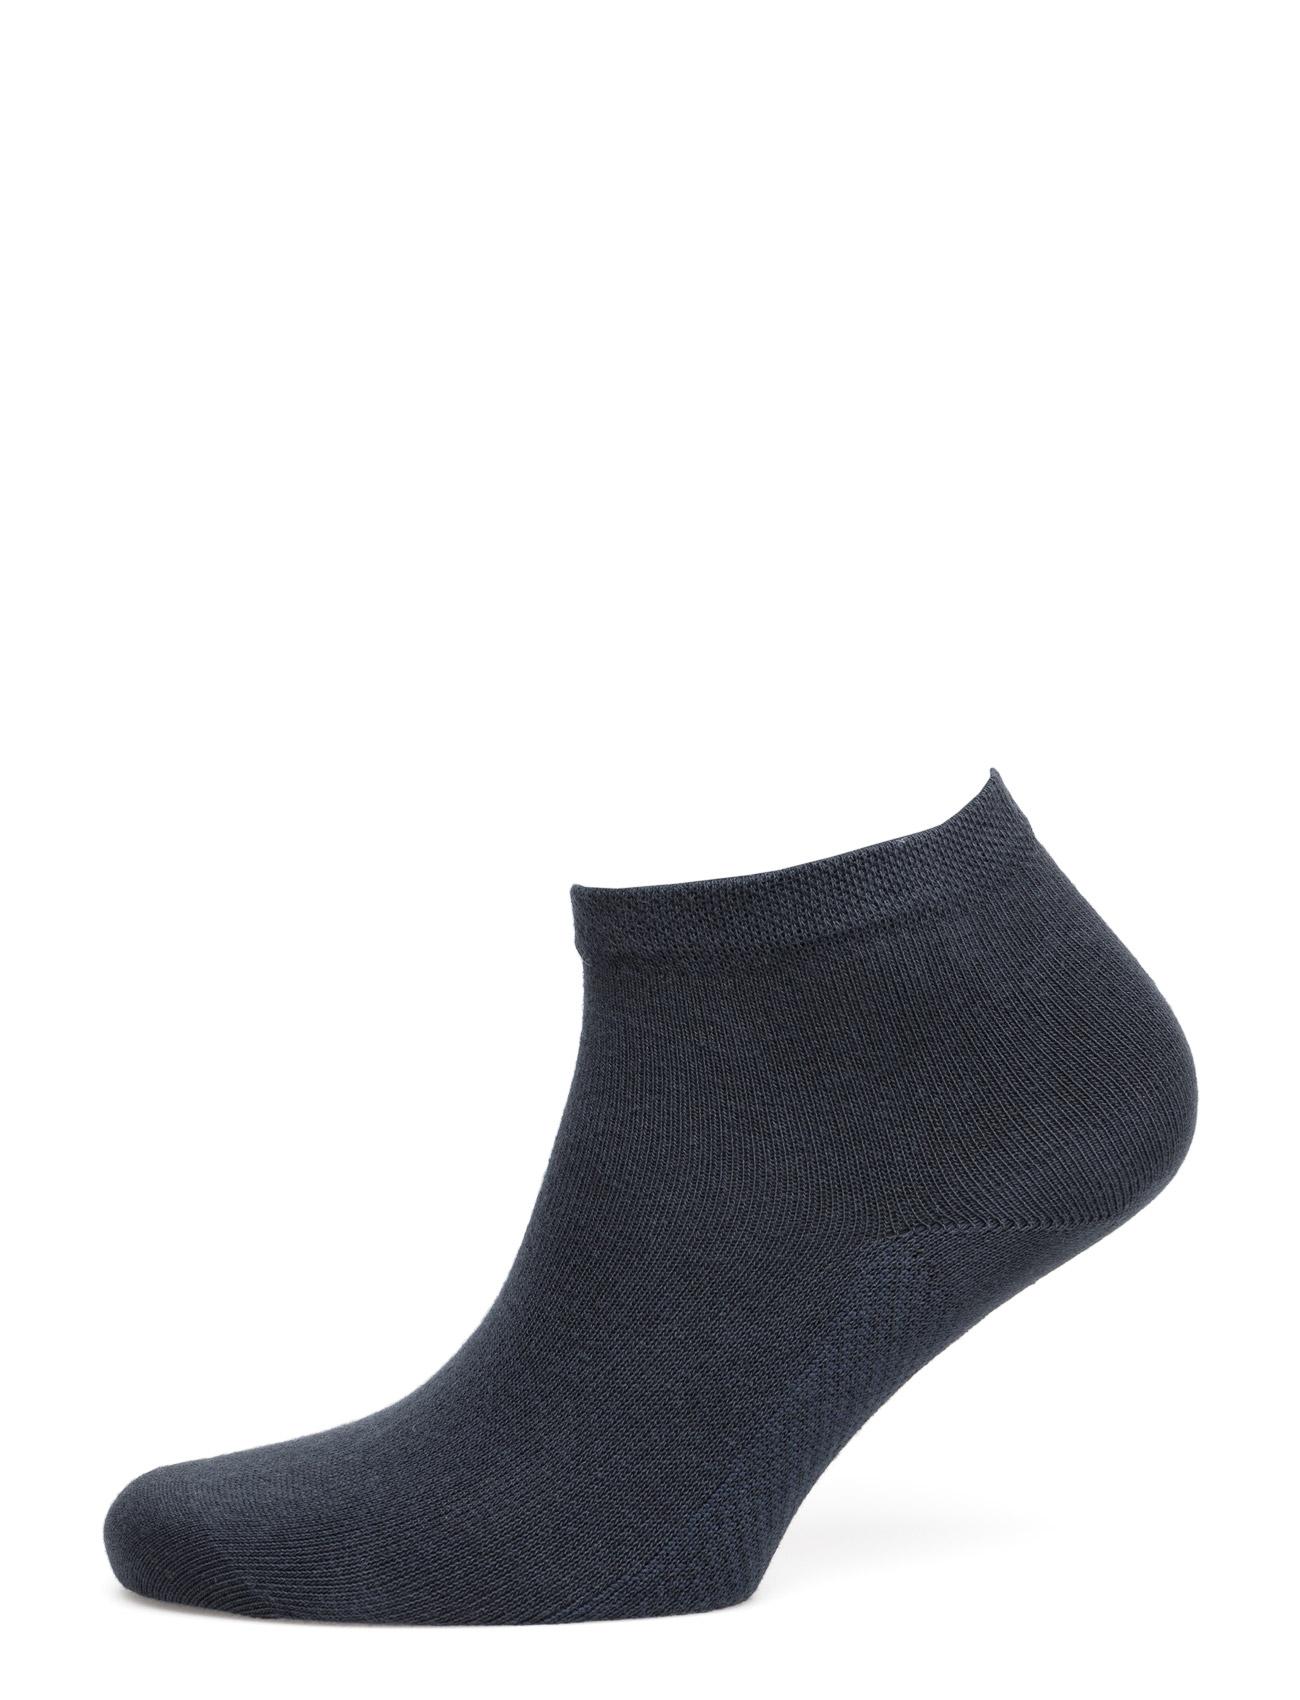 Relax Dry Cotton Hudson Strømpebukser til Kvinder i Marine blå